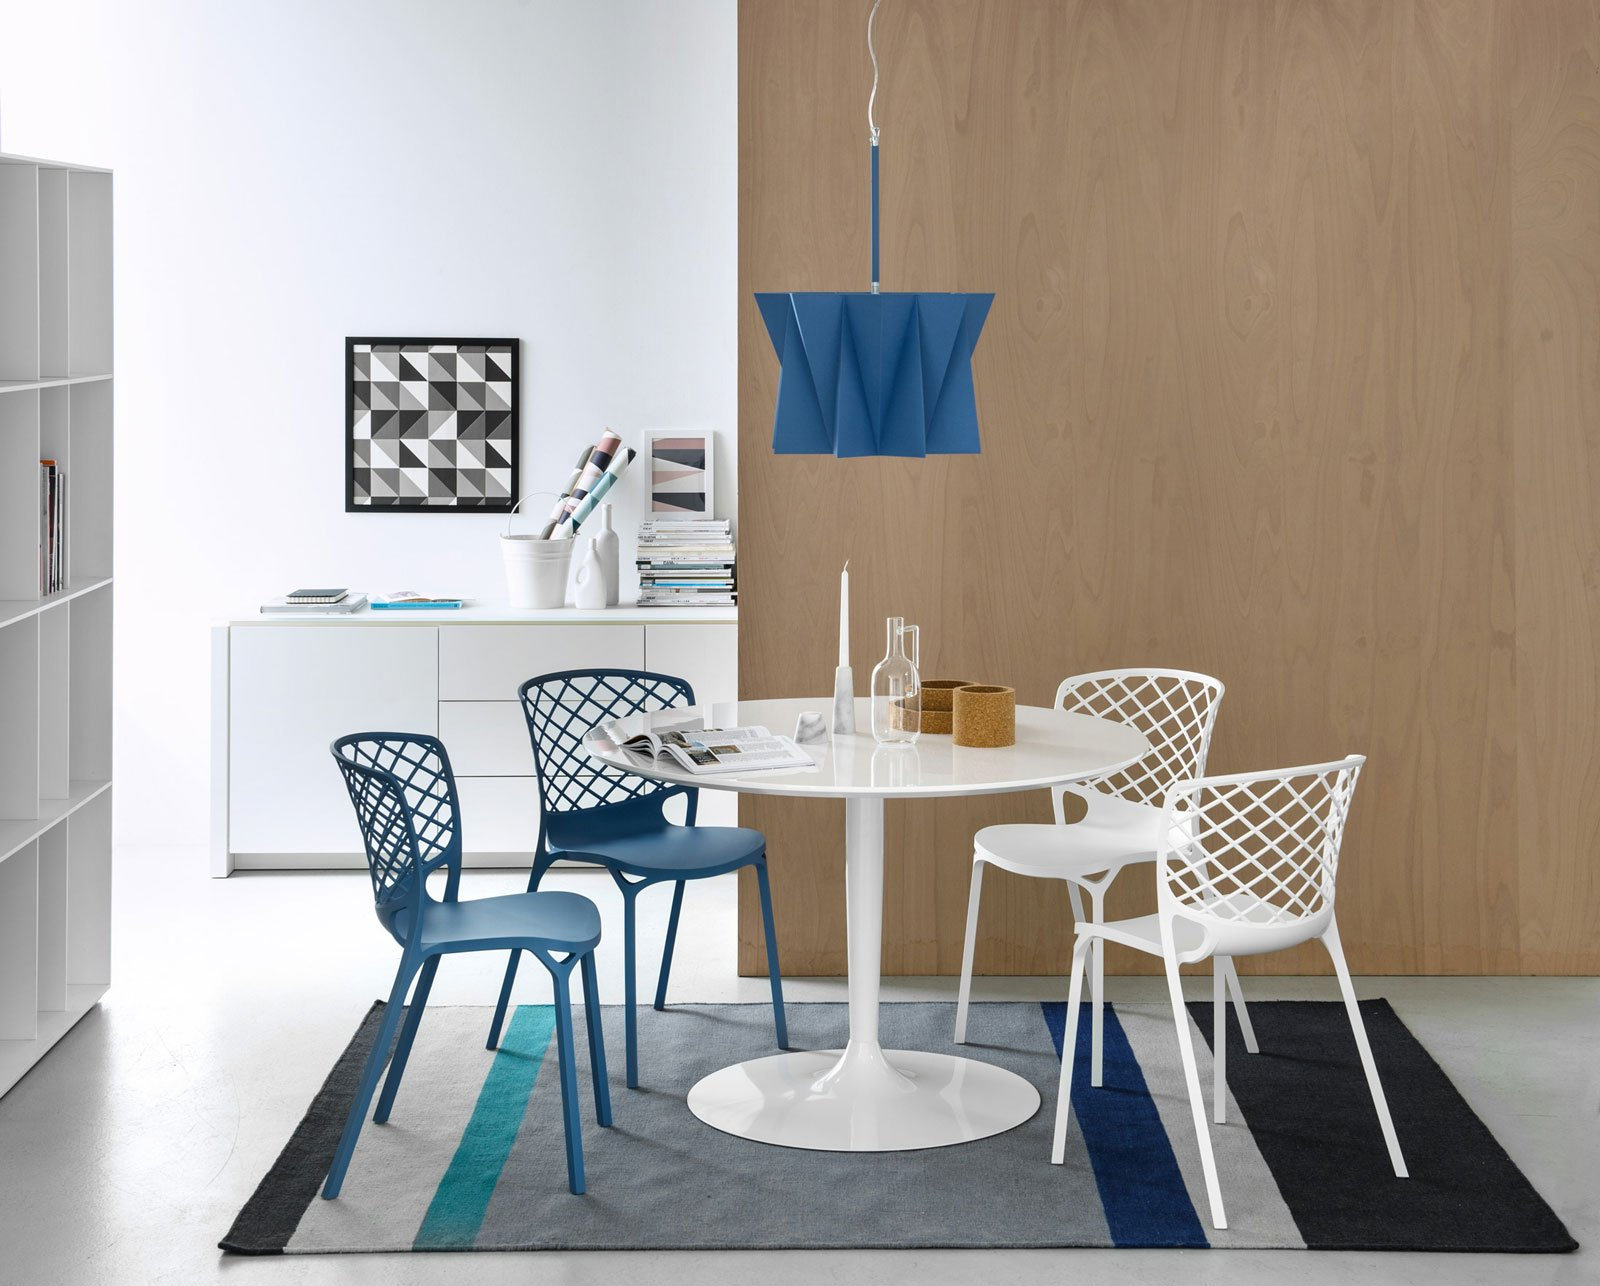 1 calligaris tavolo planet sedie gamera bianche e blu